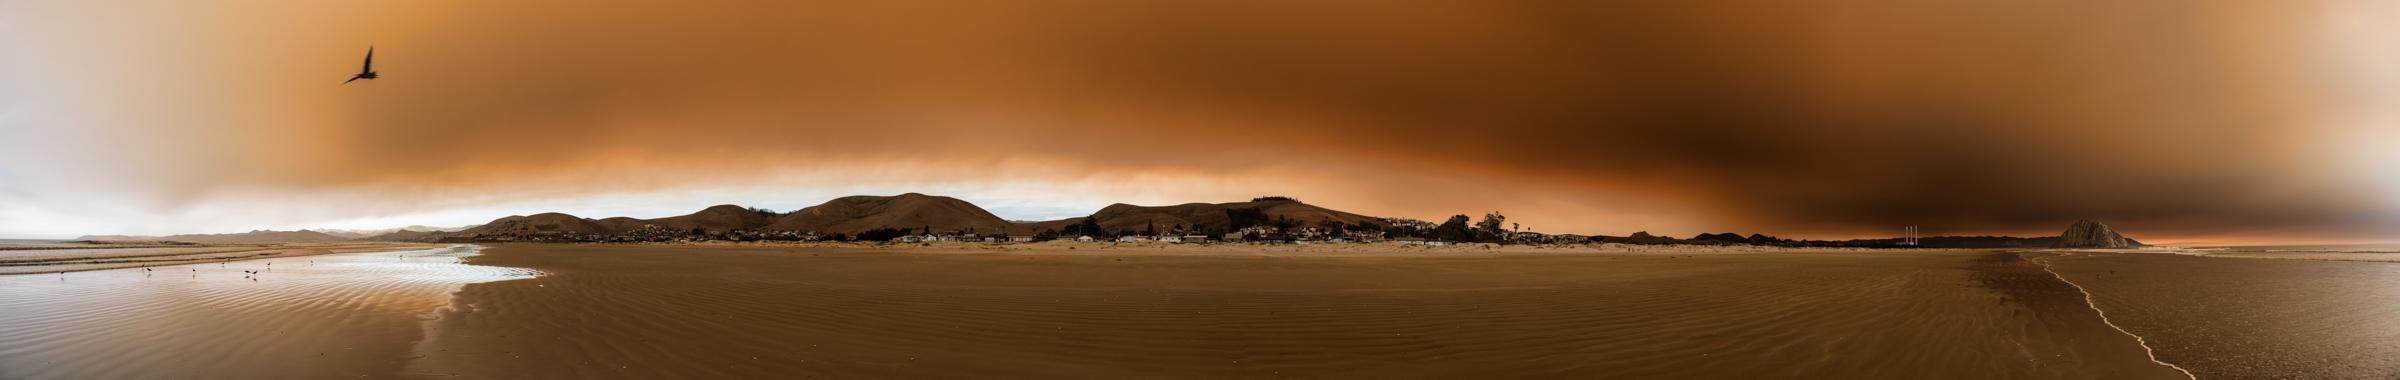 Panorama showing the smoke